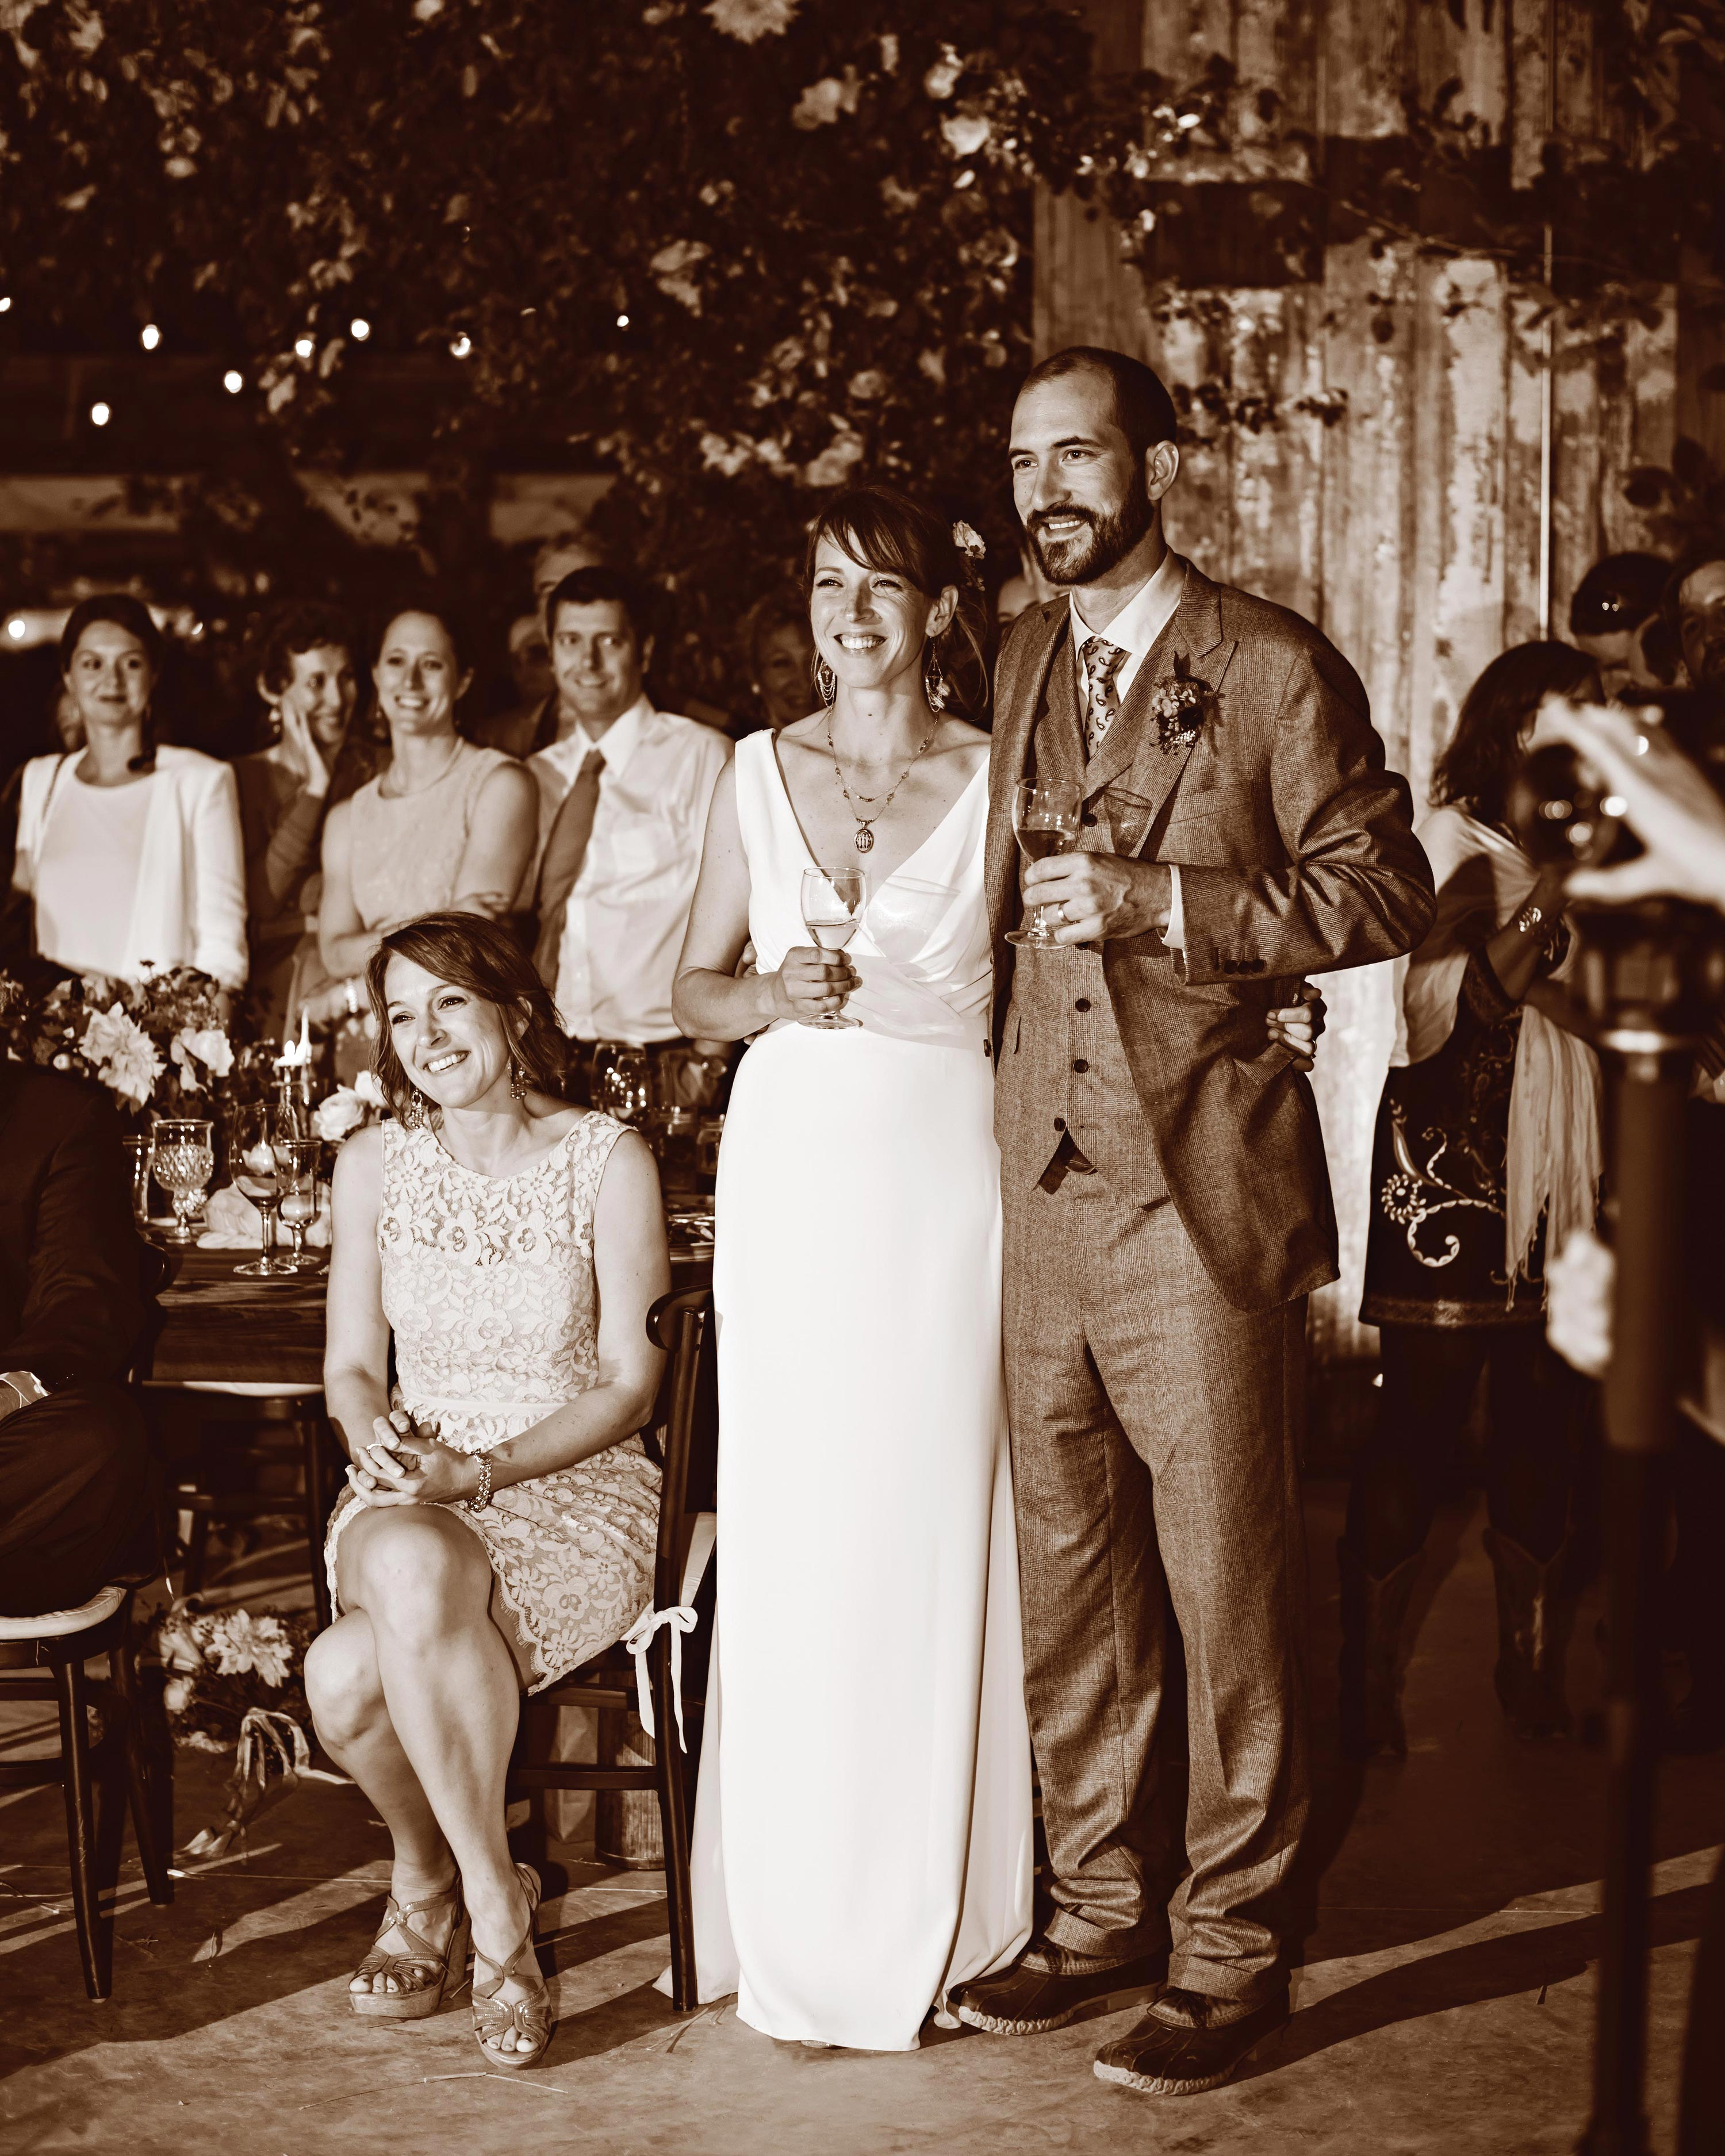 stephanie-mike-wedding-north-carolina-newlyweds-listen-to-toasts-speeches-394-s112980.jpg